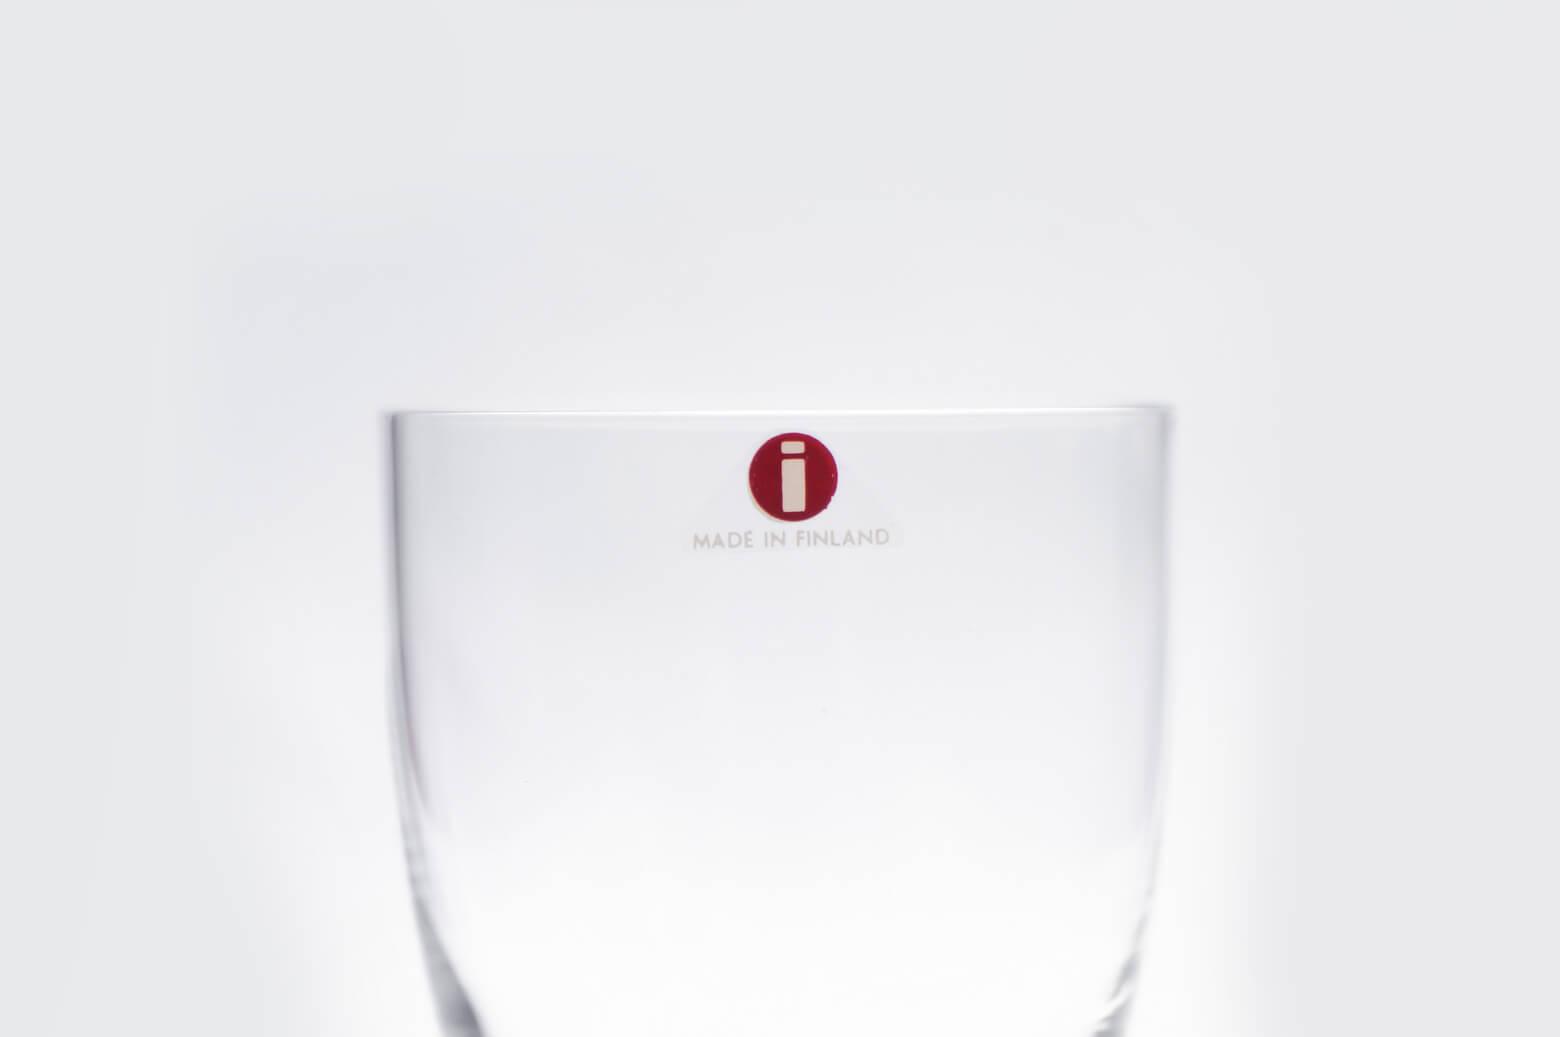 iittala Tapio Wirkkala White Wine Glass /イッタラ タピオ・ヴィルカラ ホワイト ワイン グラス 180ml 北欧食器 フィンランド 2